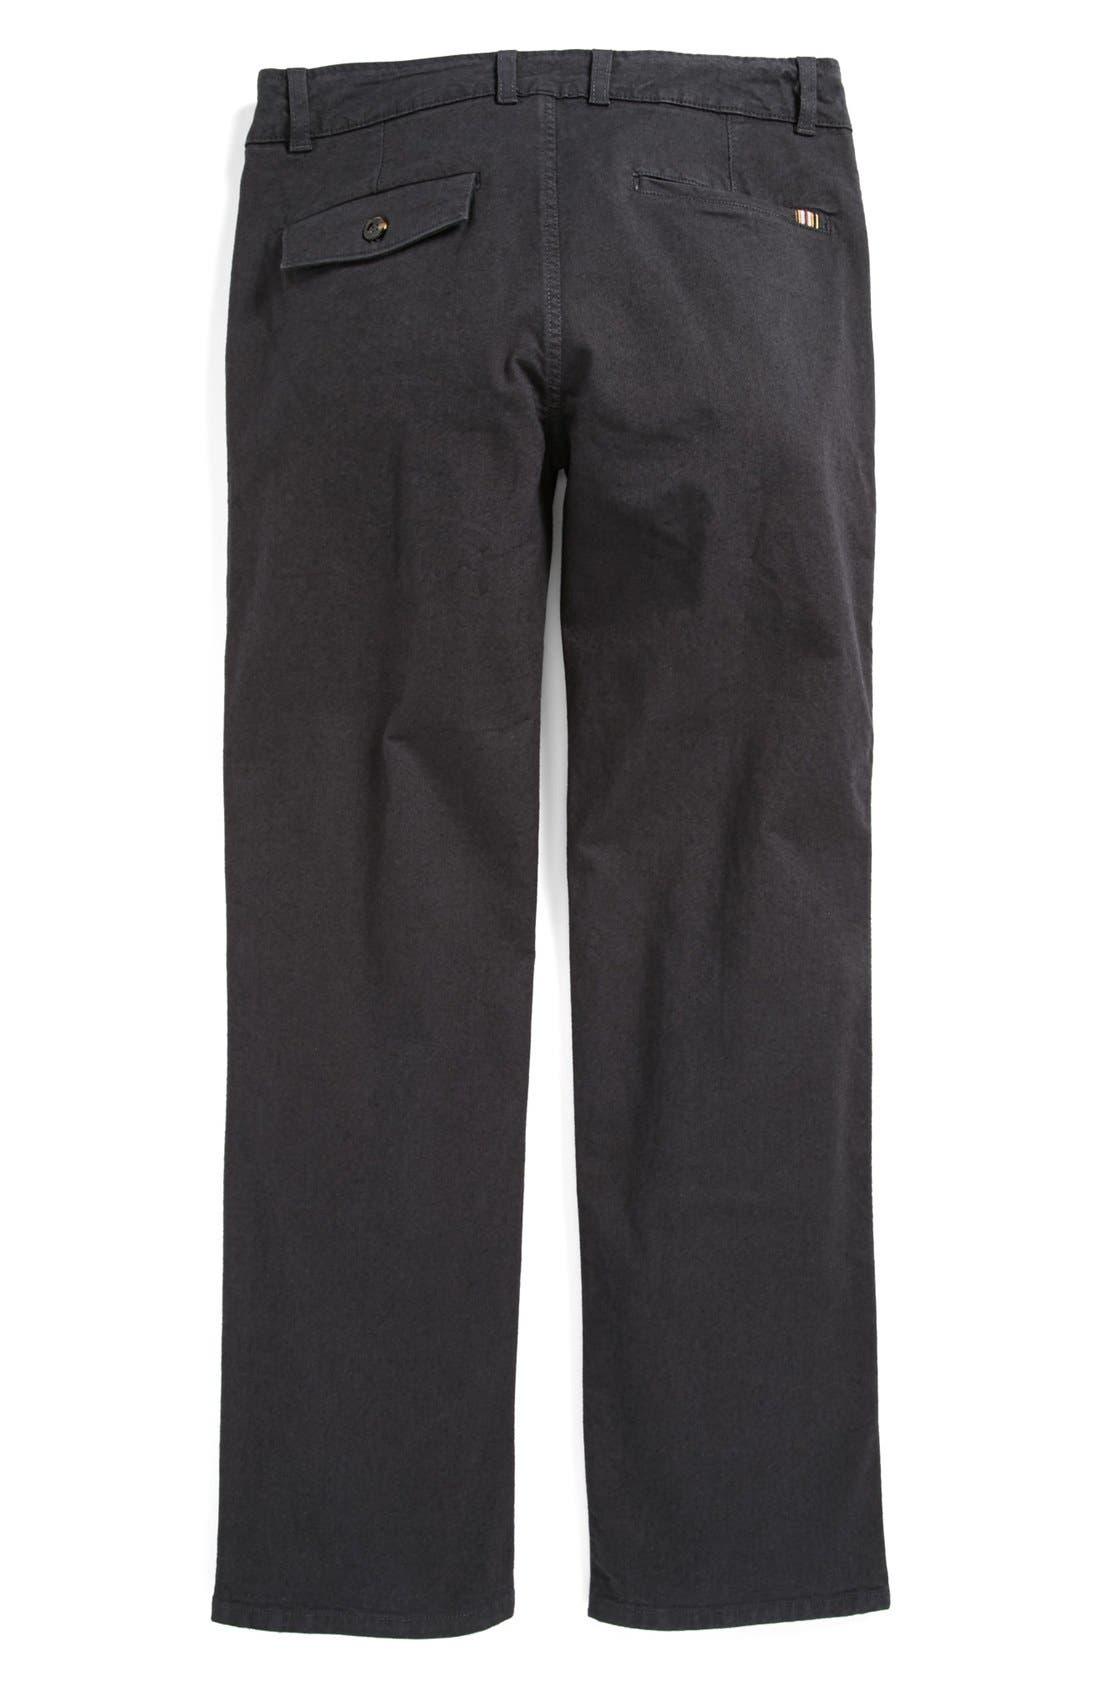 Alternate Image 2  - Paul Smith Junior 'Eamon' Pants (Toddler Boys, Little Boys & Big Boys)